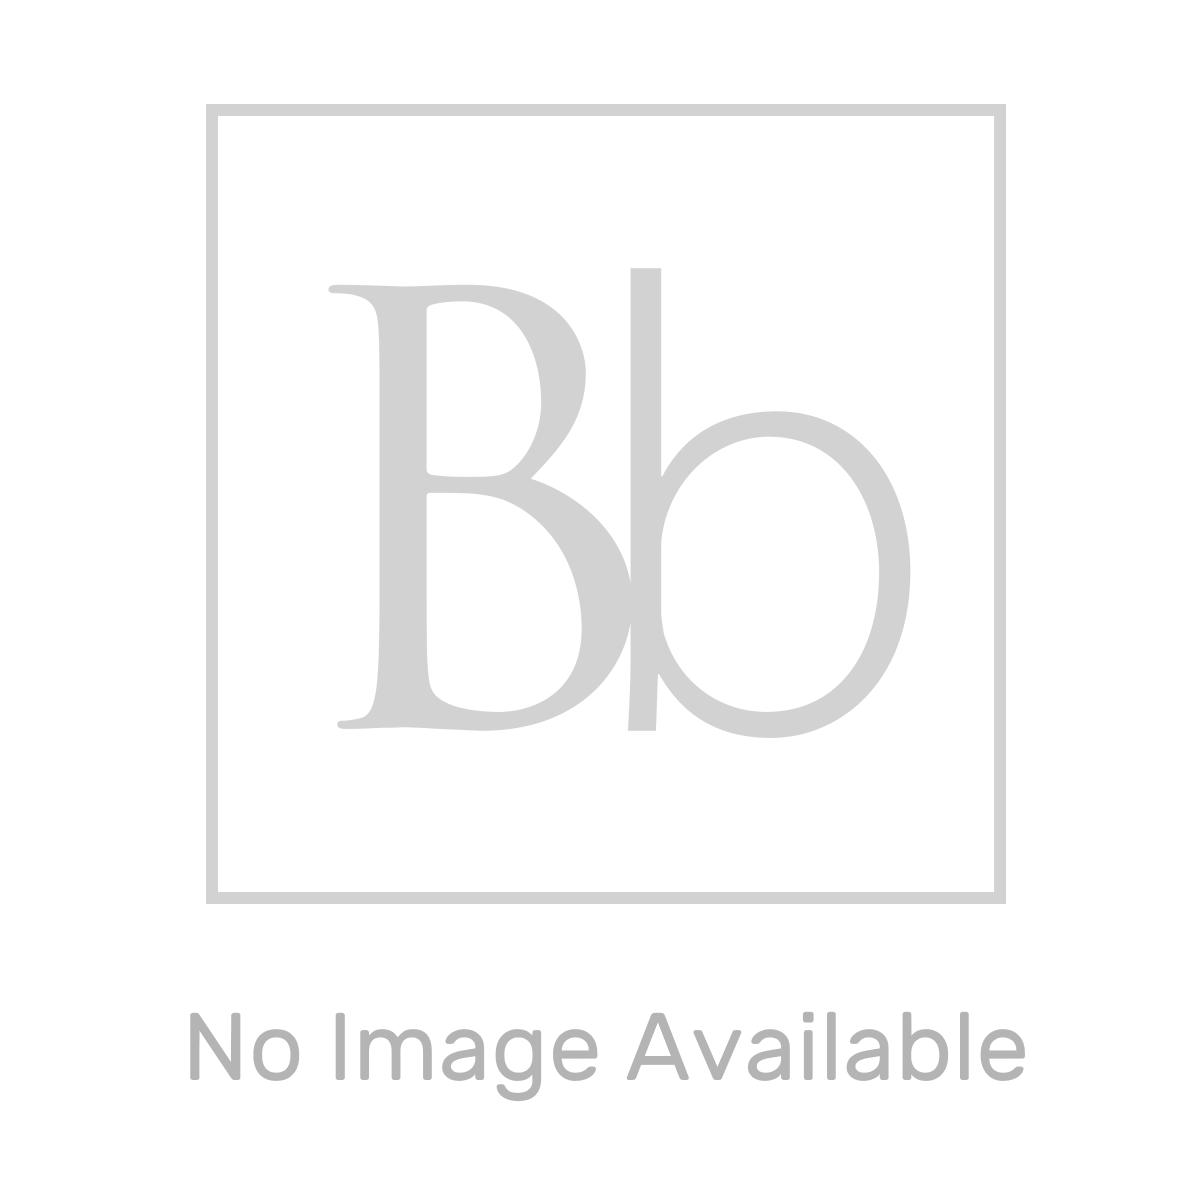 Kartell K-VIT Korsika Close Coupled Toilet with Soft Close Seat